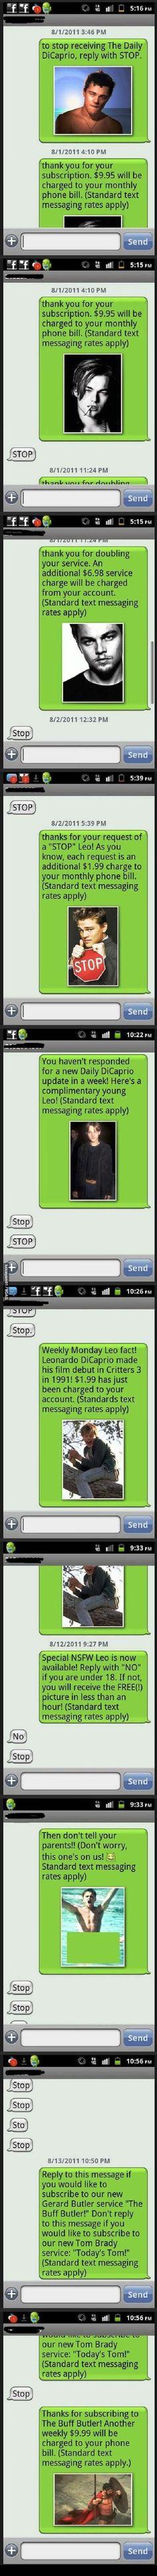 35 Funny April Fools Day Text Pranks